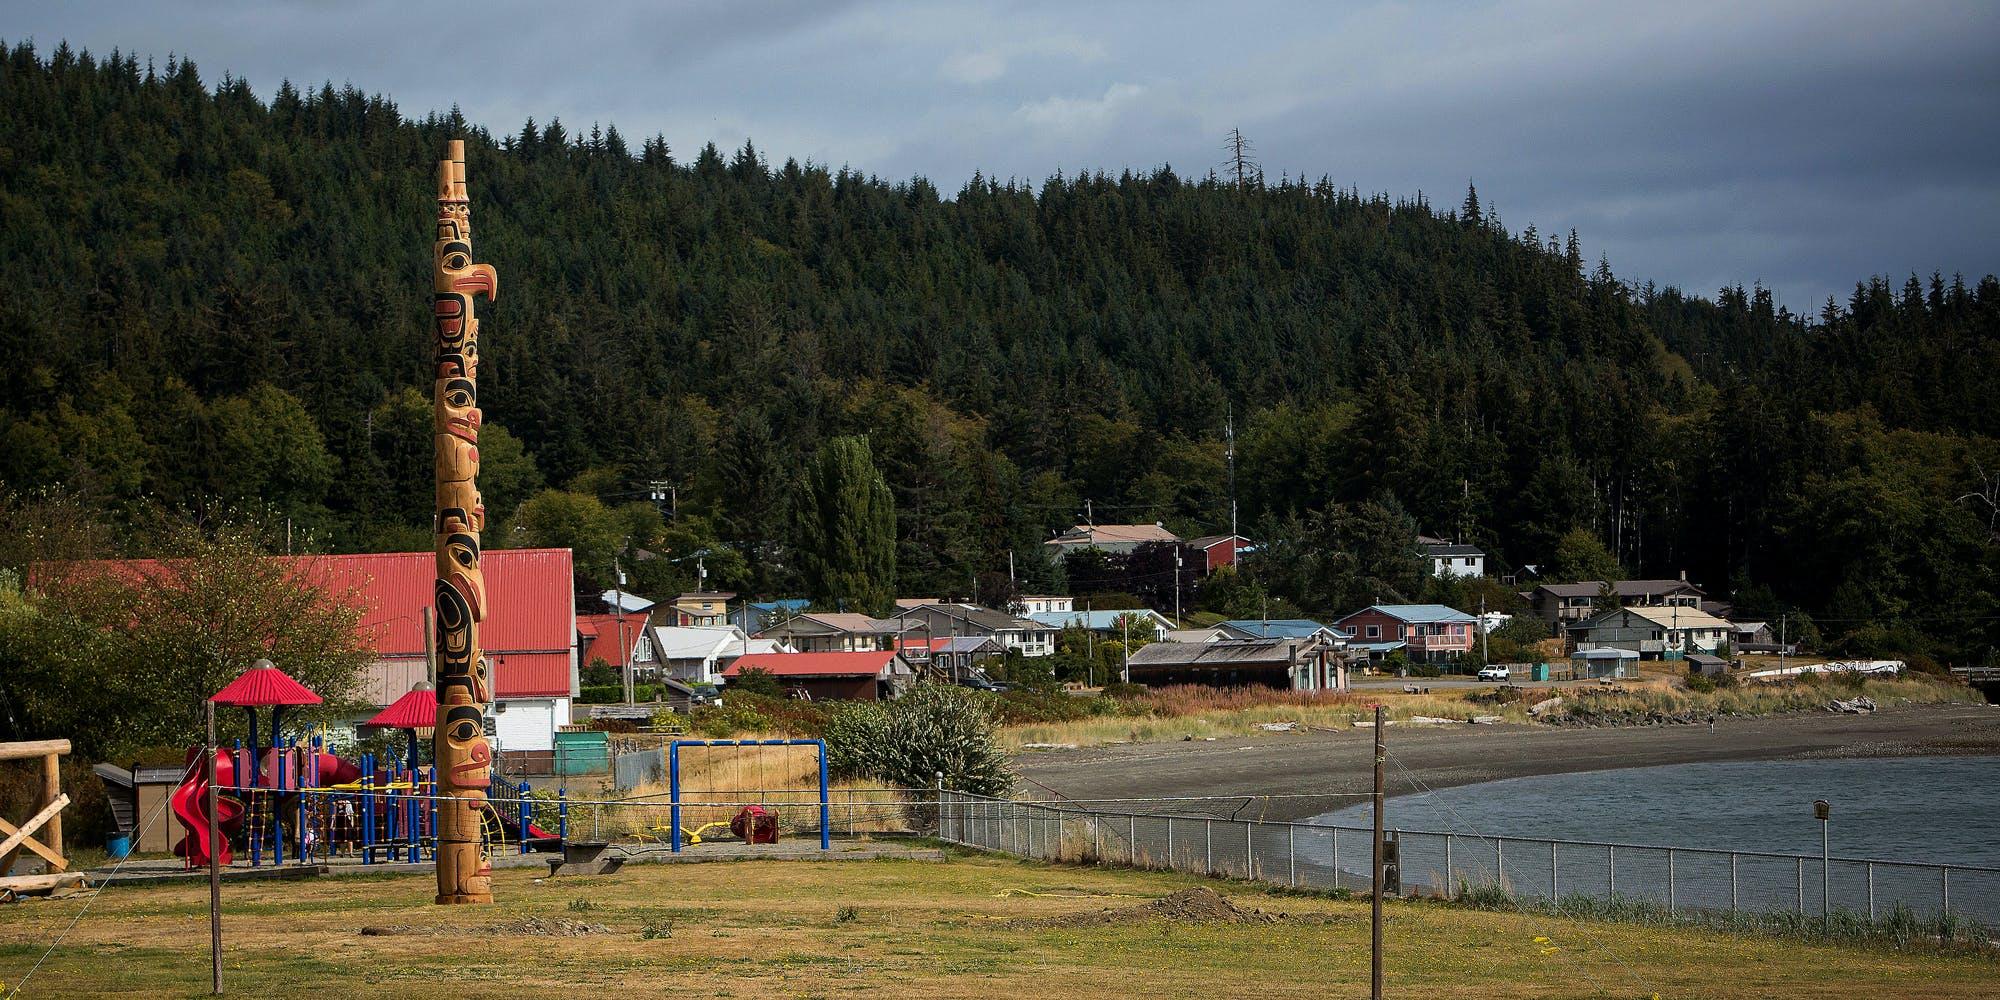 Indigenous communities want to introduce independent marijuana shops